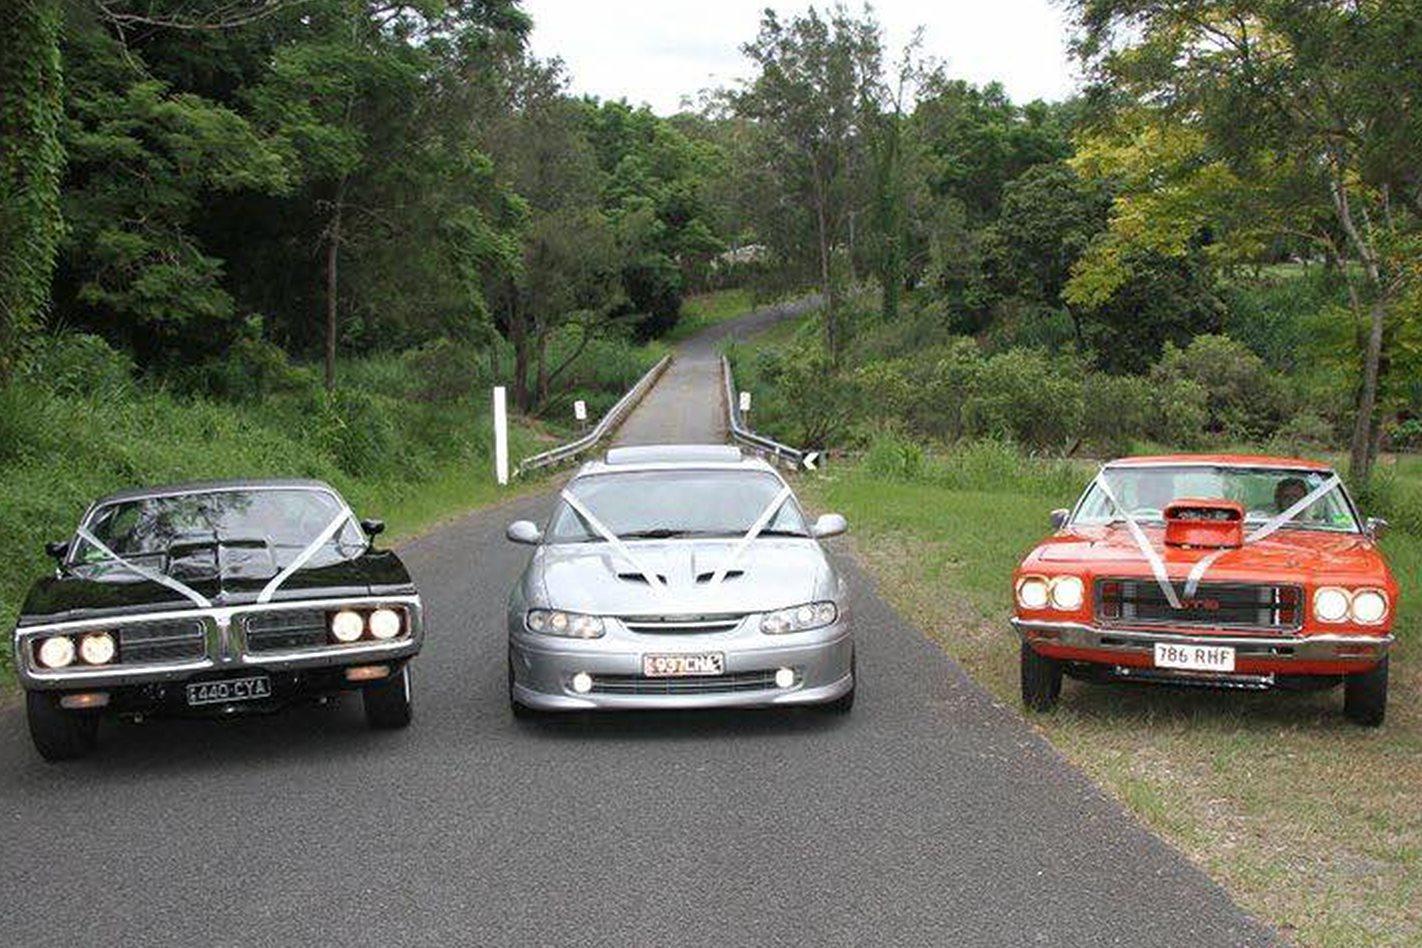 Marty Shea's wedding cars